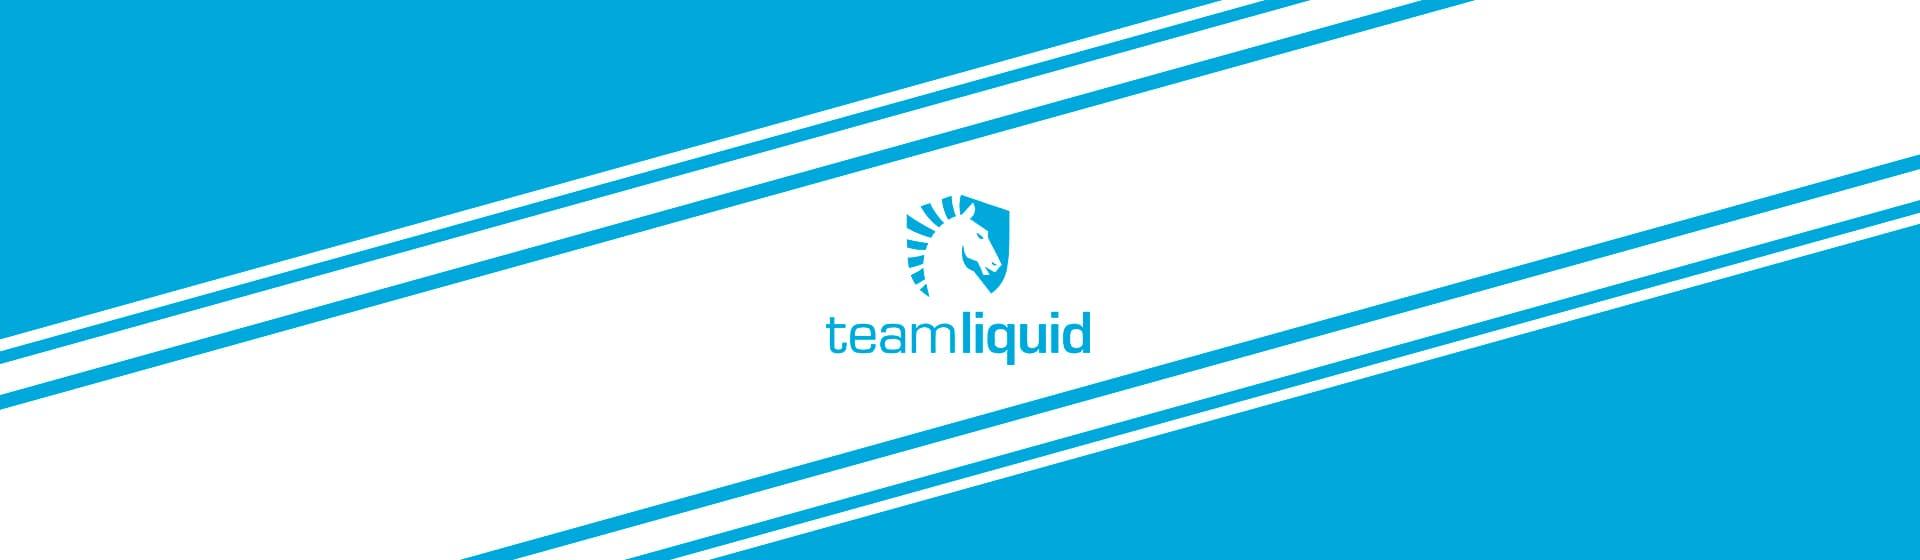 Team Liquid - Скатерти